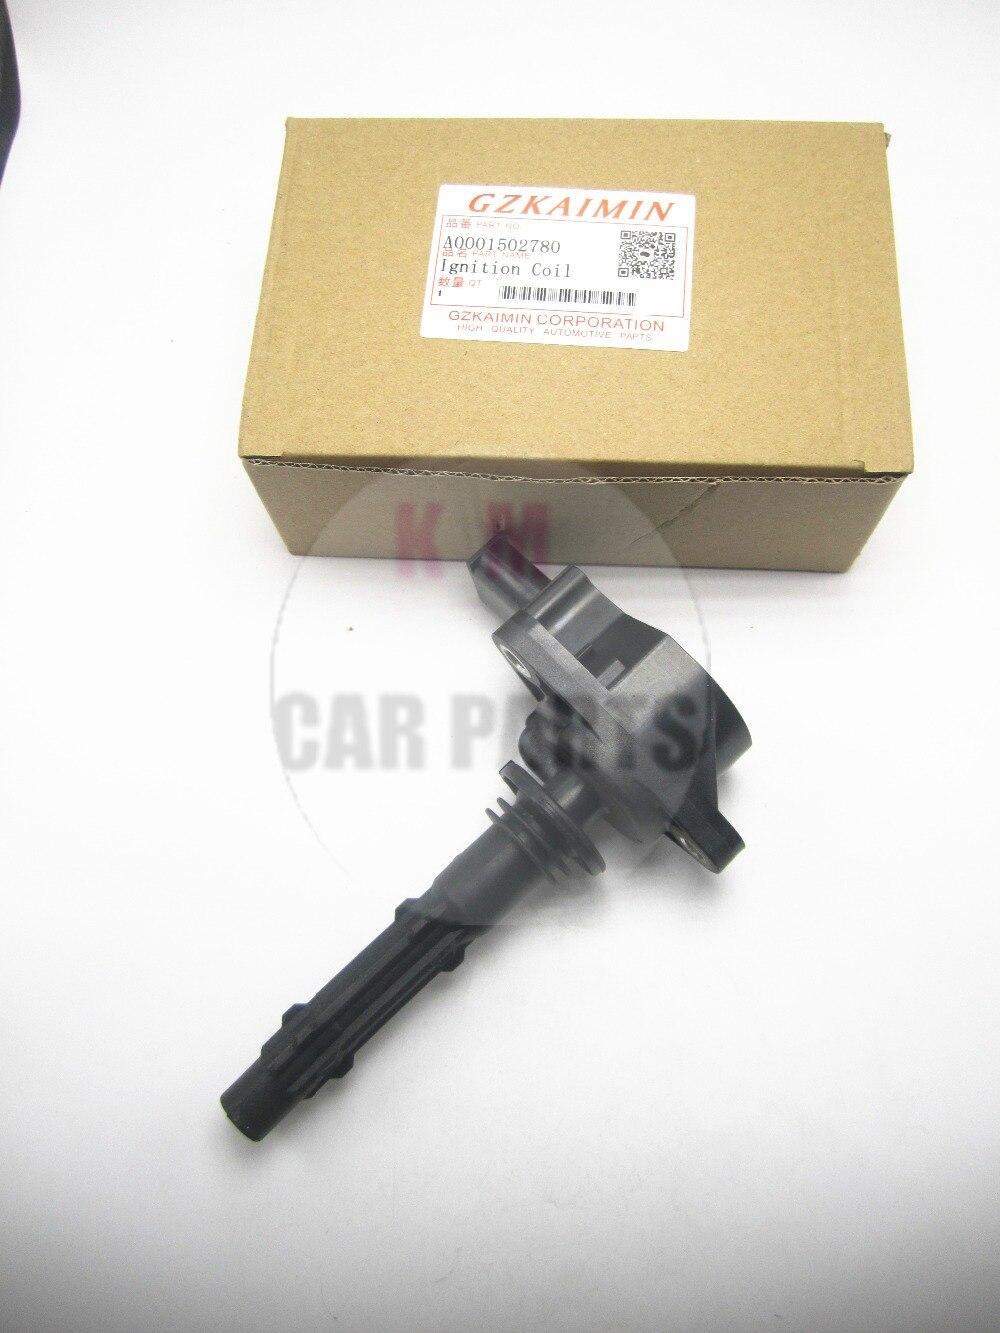 NEW Ignition Coil PACK A0001502780 For MERCEDES C E CLK G GL GLK ML R S SLK CLASS A 000 150 27 80 2729060060 0001502780 A000150